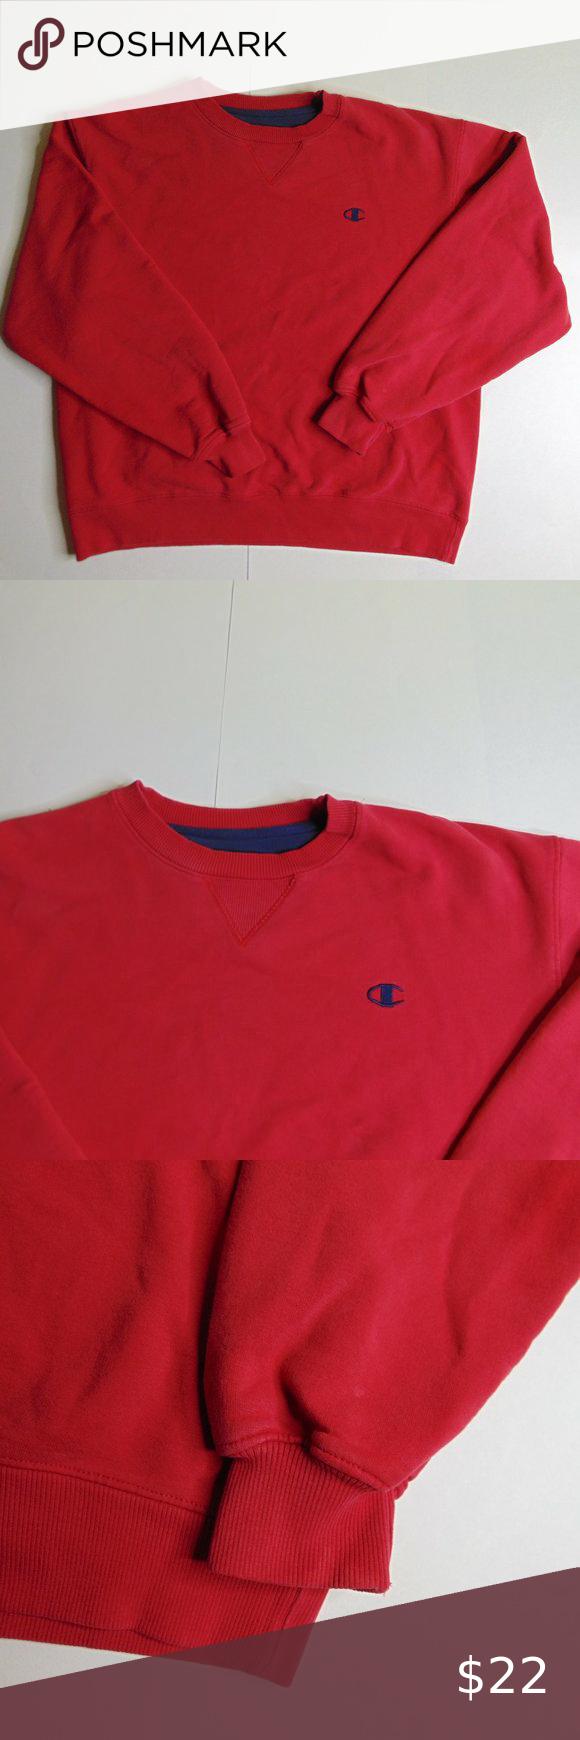 Champion Crewneck Sweatshirt Red Athletic Pullover Champion Crewneck Sweatshirt Crew Neck Sweatshirt Sweatshirts [ 1740 x 580 Pixel ]